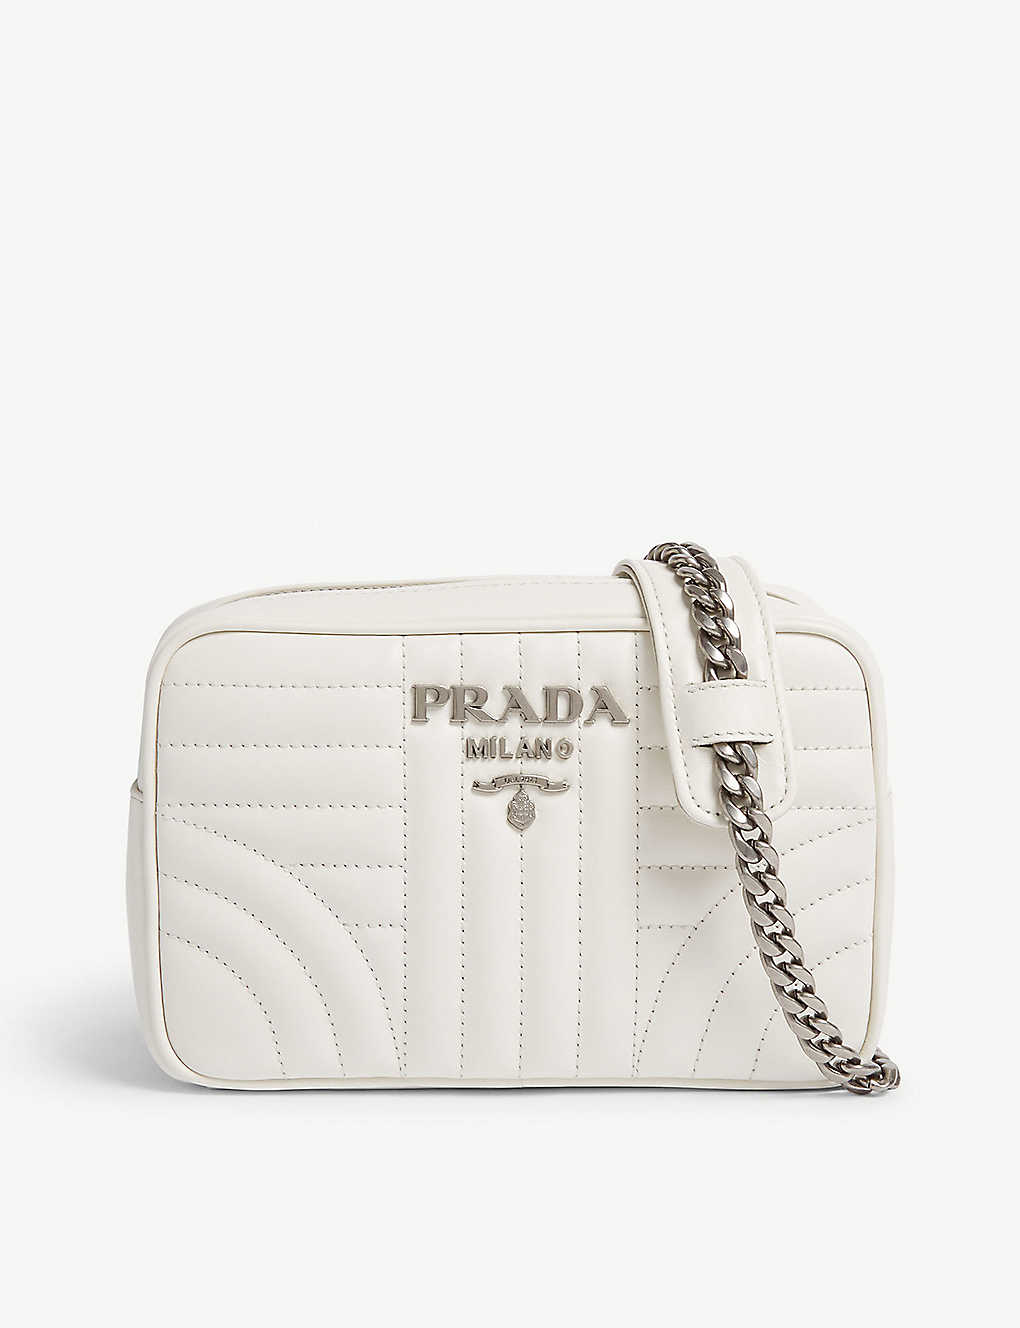 ccf1a92d3bcf PRADA - Diagramme leather shoulder bag | Selfridges.com